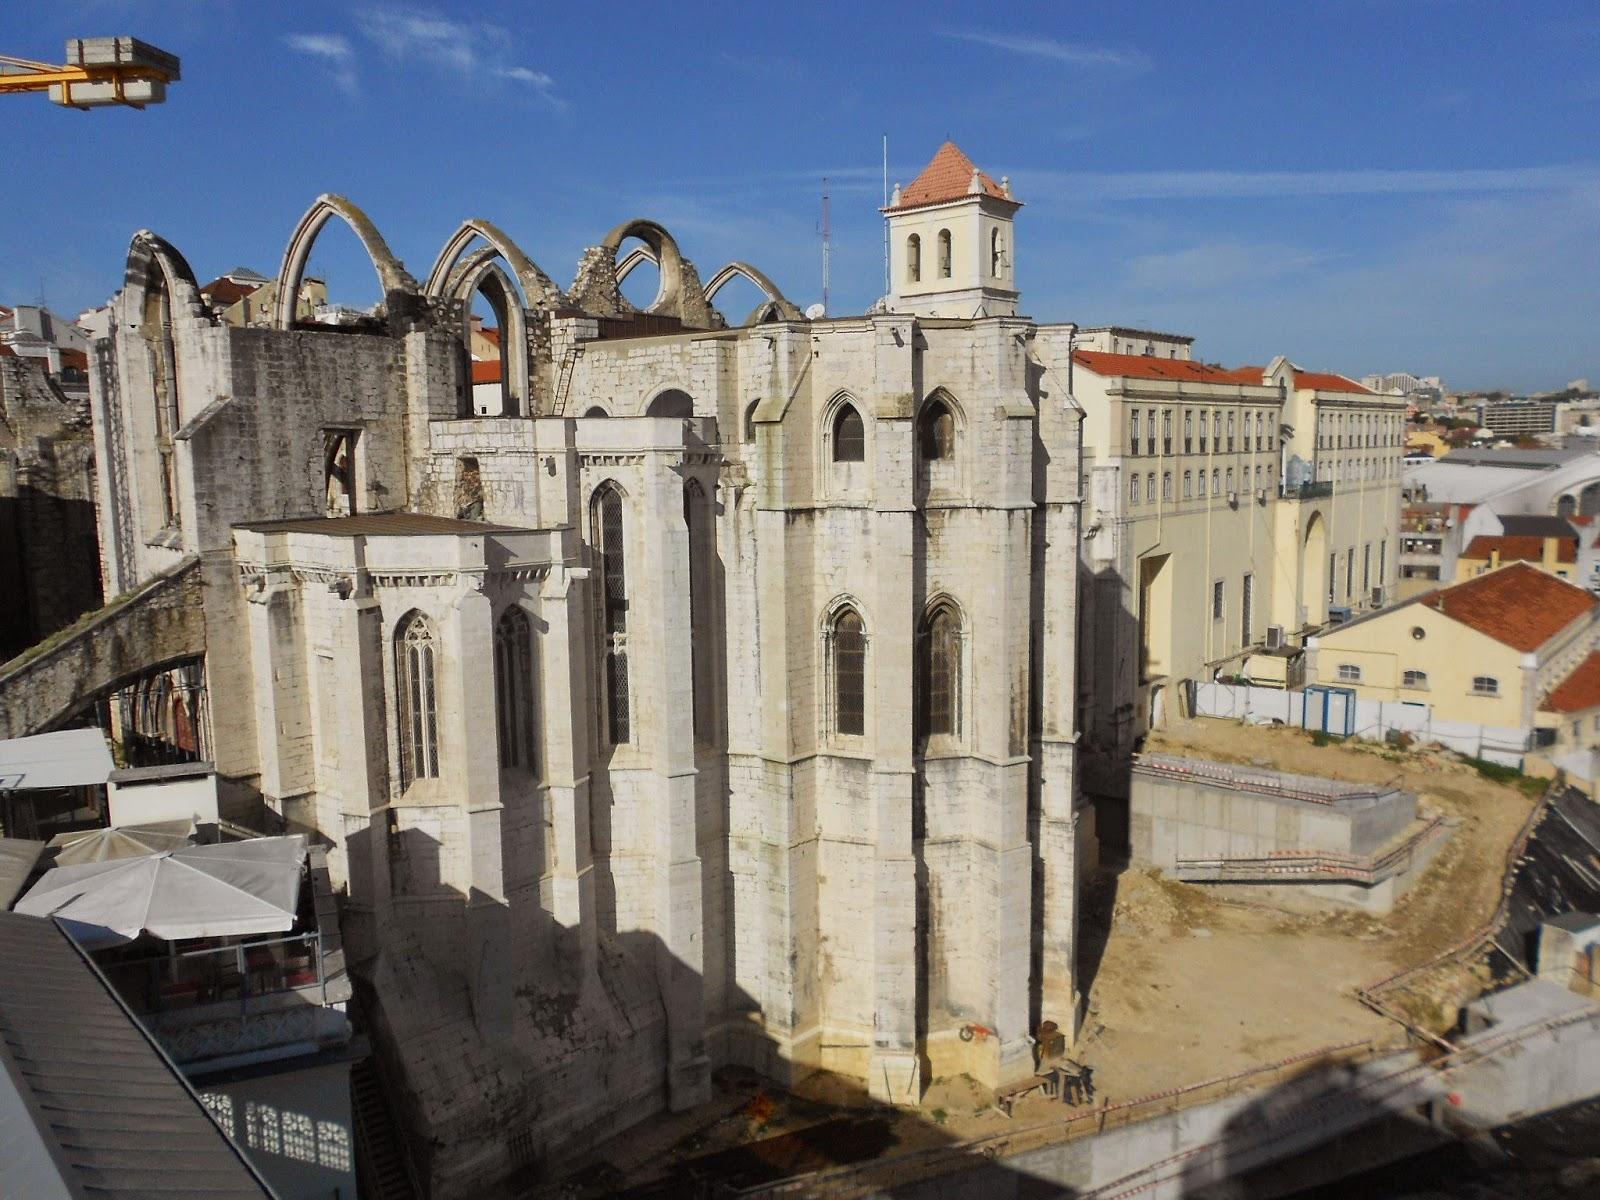 Cathédrale Santa Maria Maior de Lisbonne - Lisboa - Lisbon